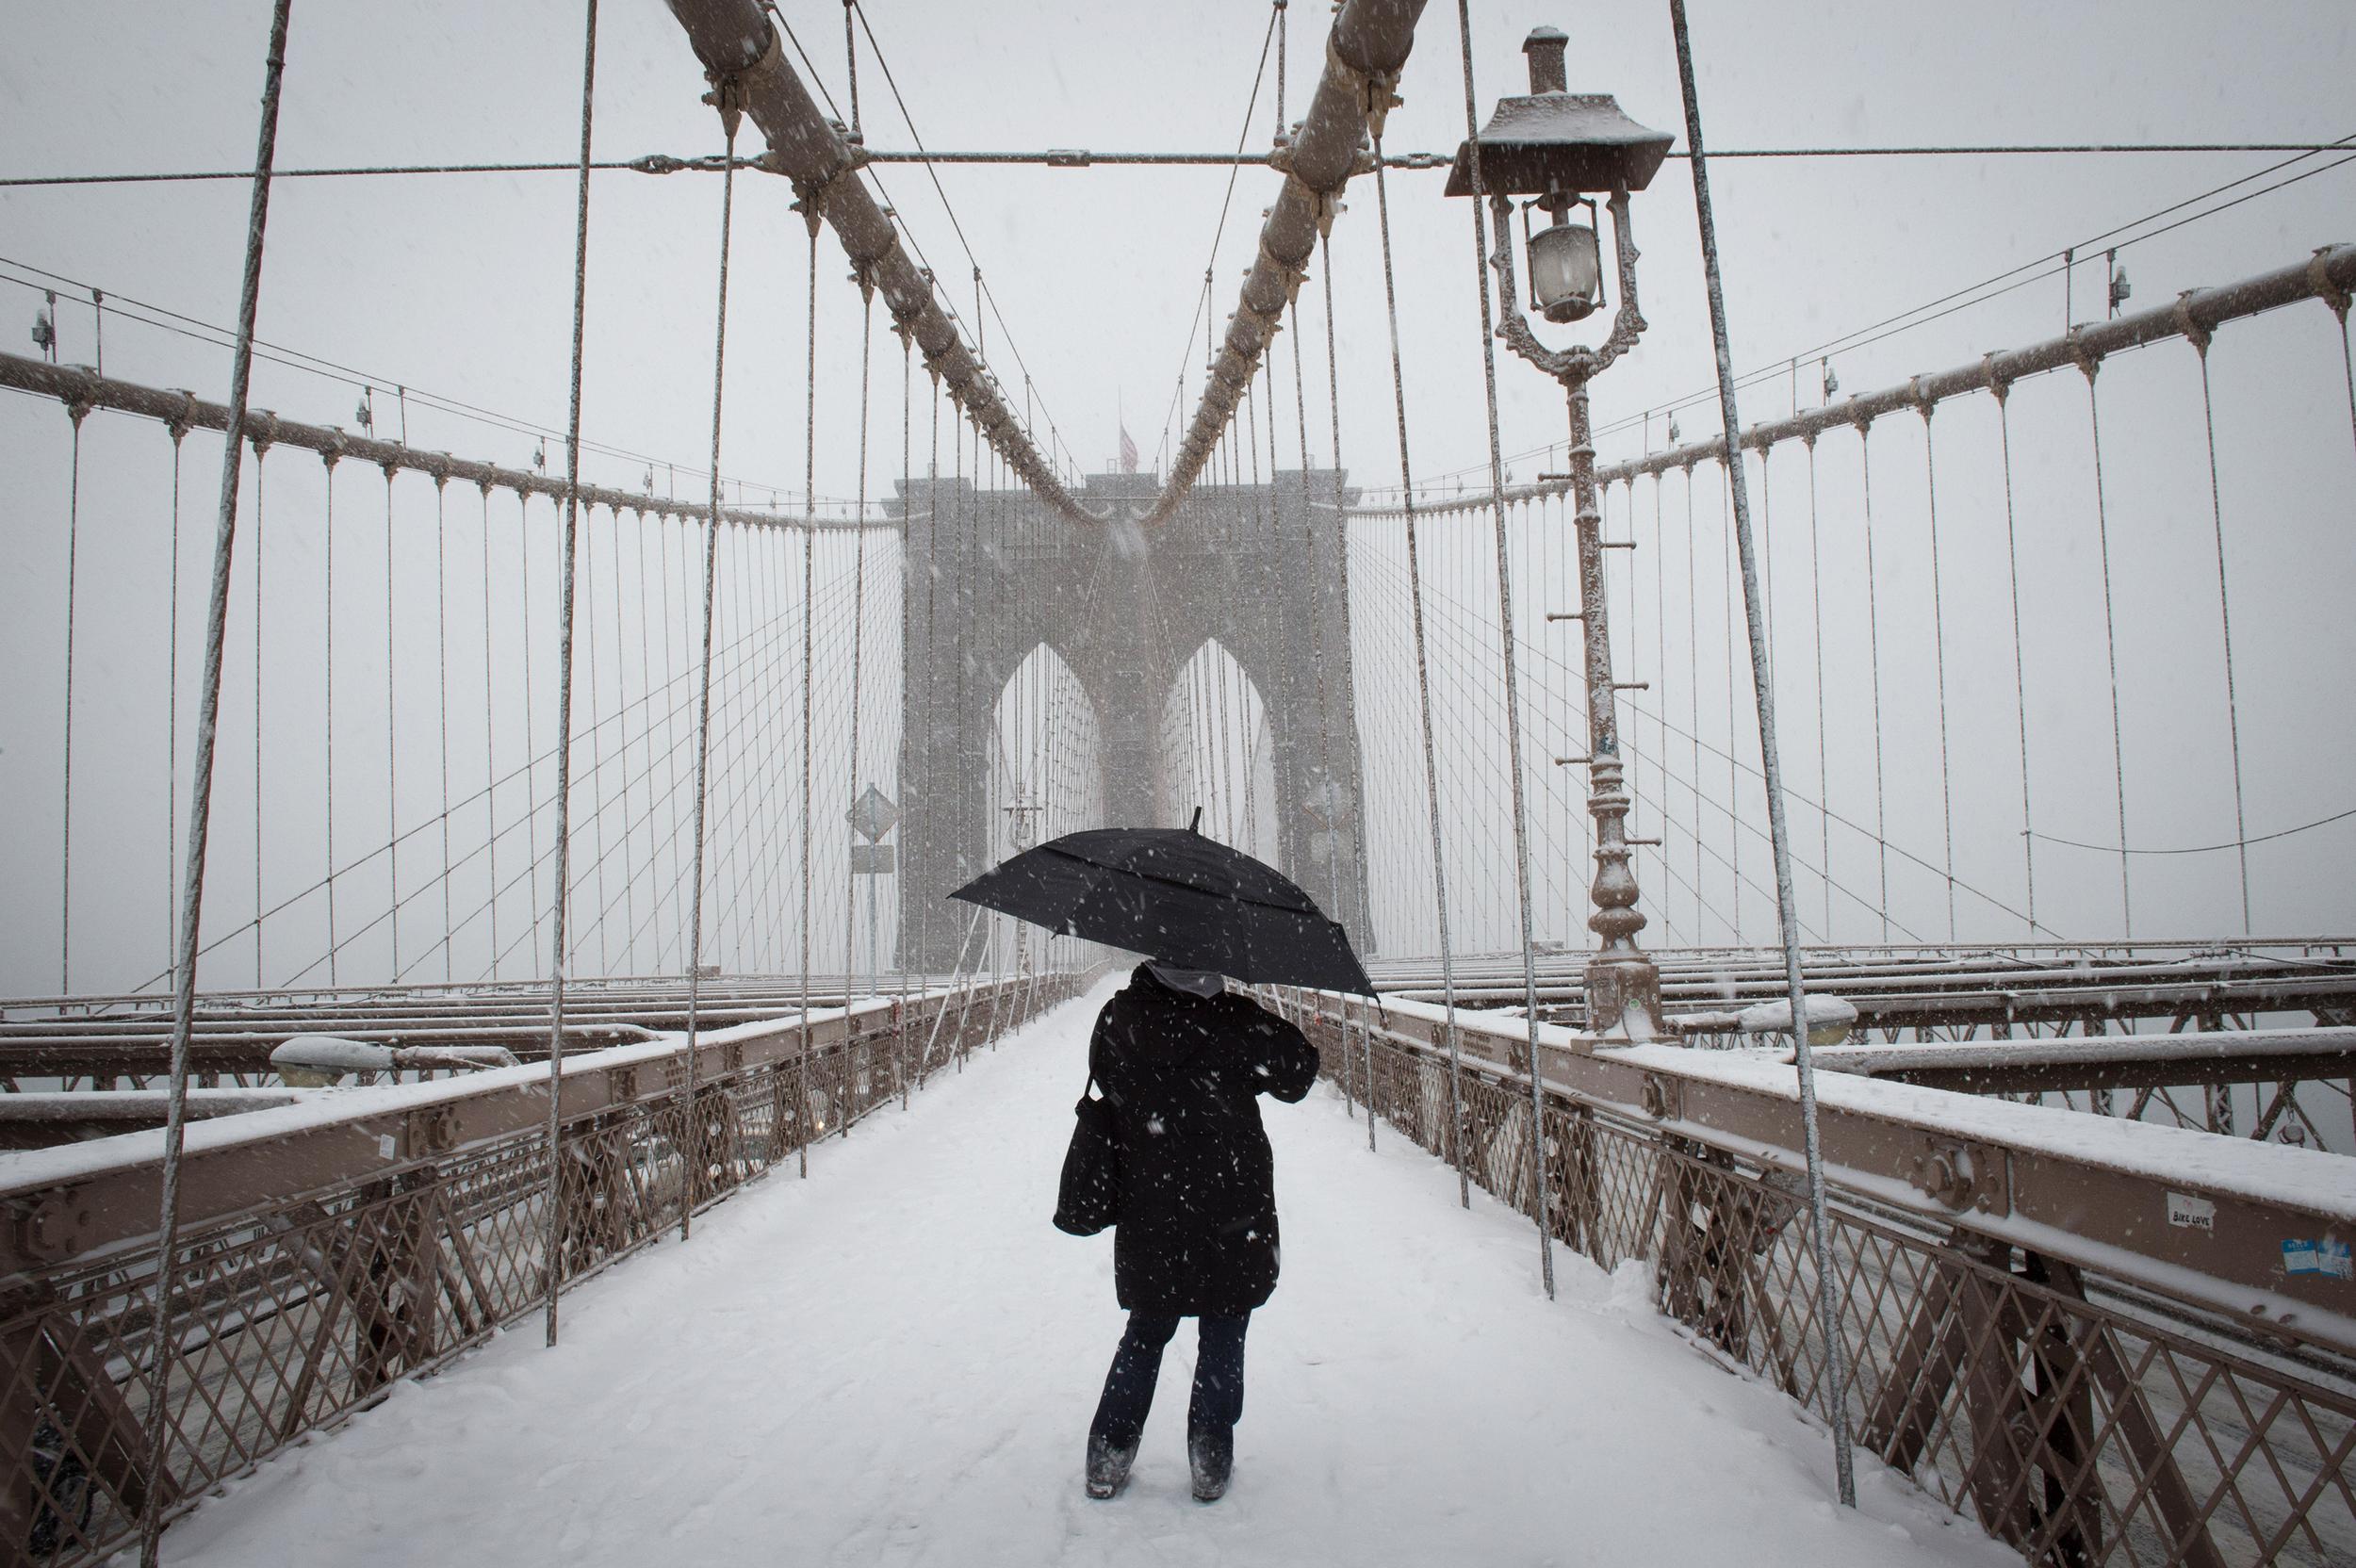 A pedestrian on The Brooklyn Bridge as a snowstorm hits the Metropolitan area, Thursday, March 5, 2015.